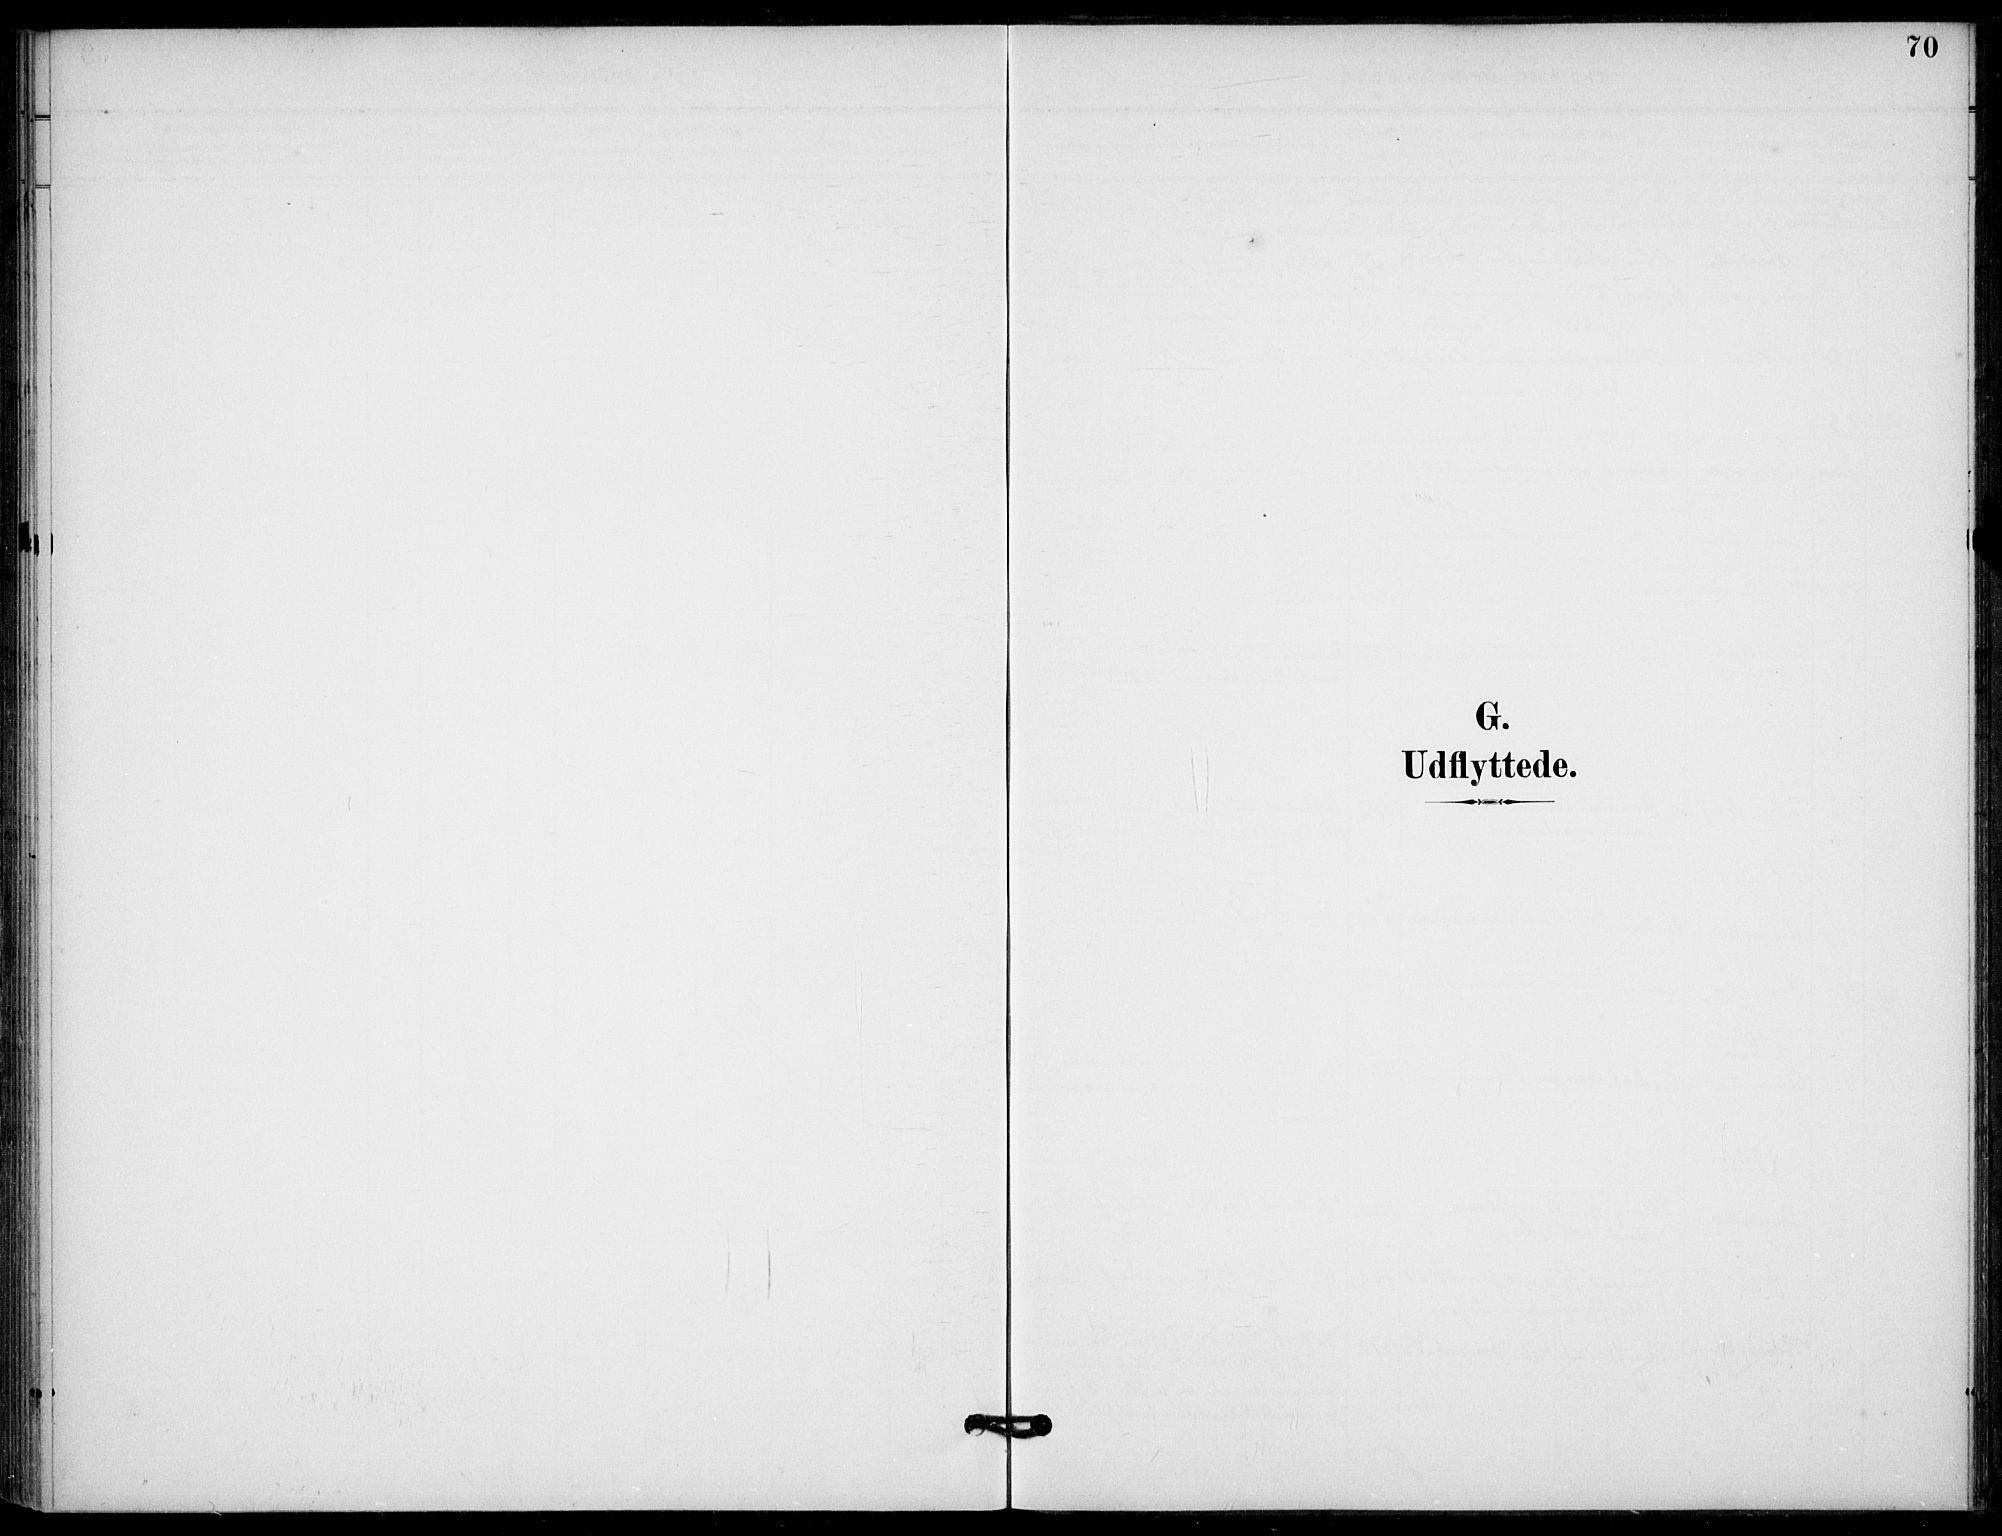 SAKO, Lunde kirkebøker, F/Fb/L0004: Ministerialbok nr. II 4, 1892-1907, s. 70